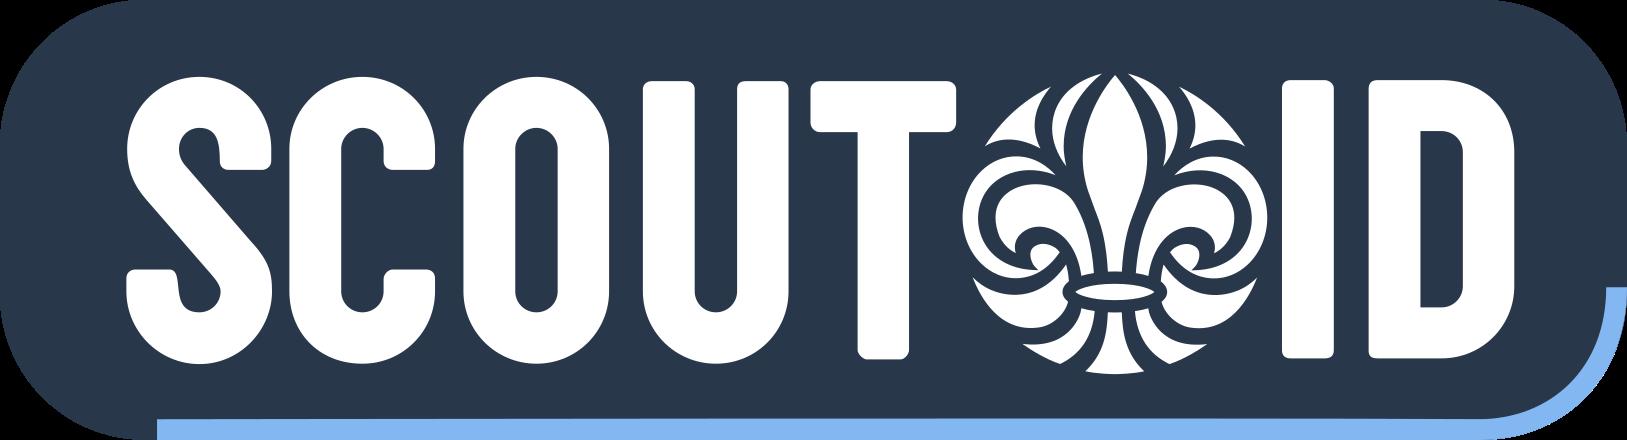 Logga in med ScoutID